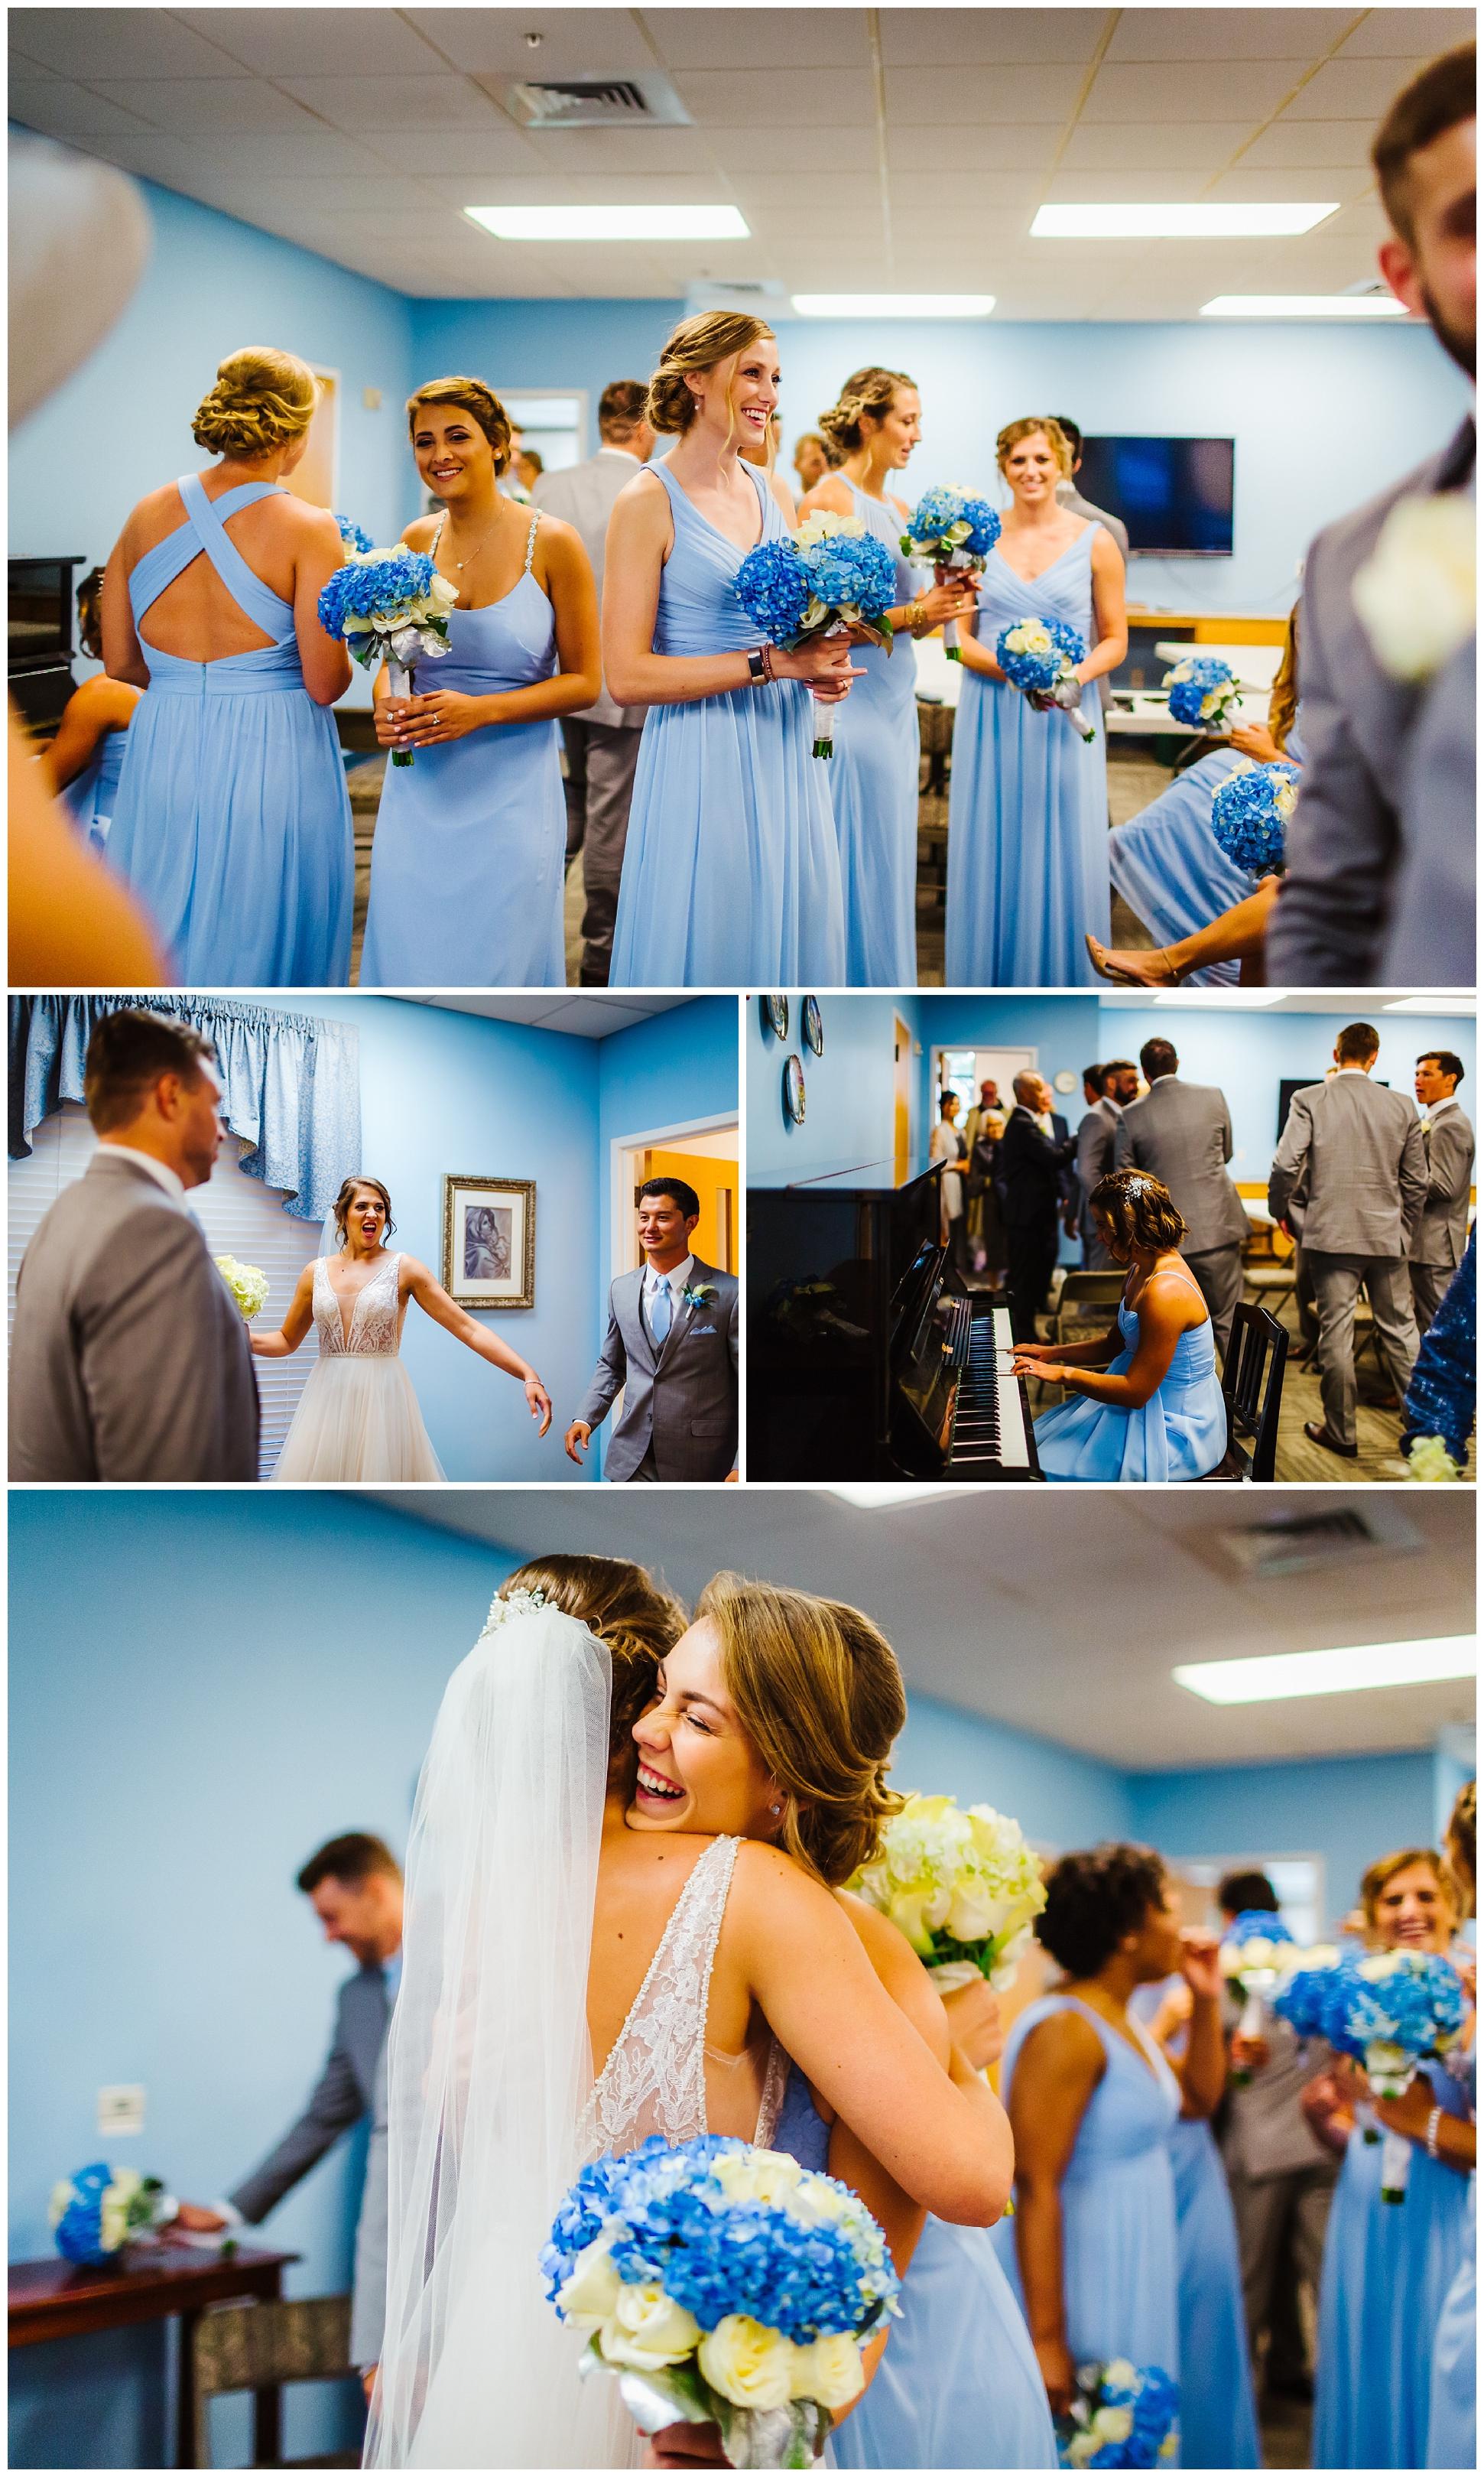 mahaffey-theater-big-military-wedding-st-pete-photographer-blue_0043.jpg